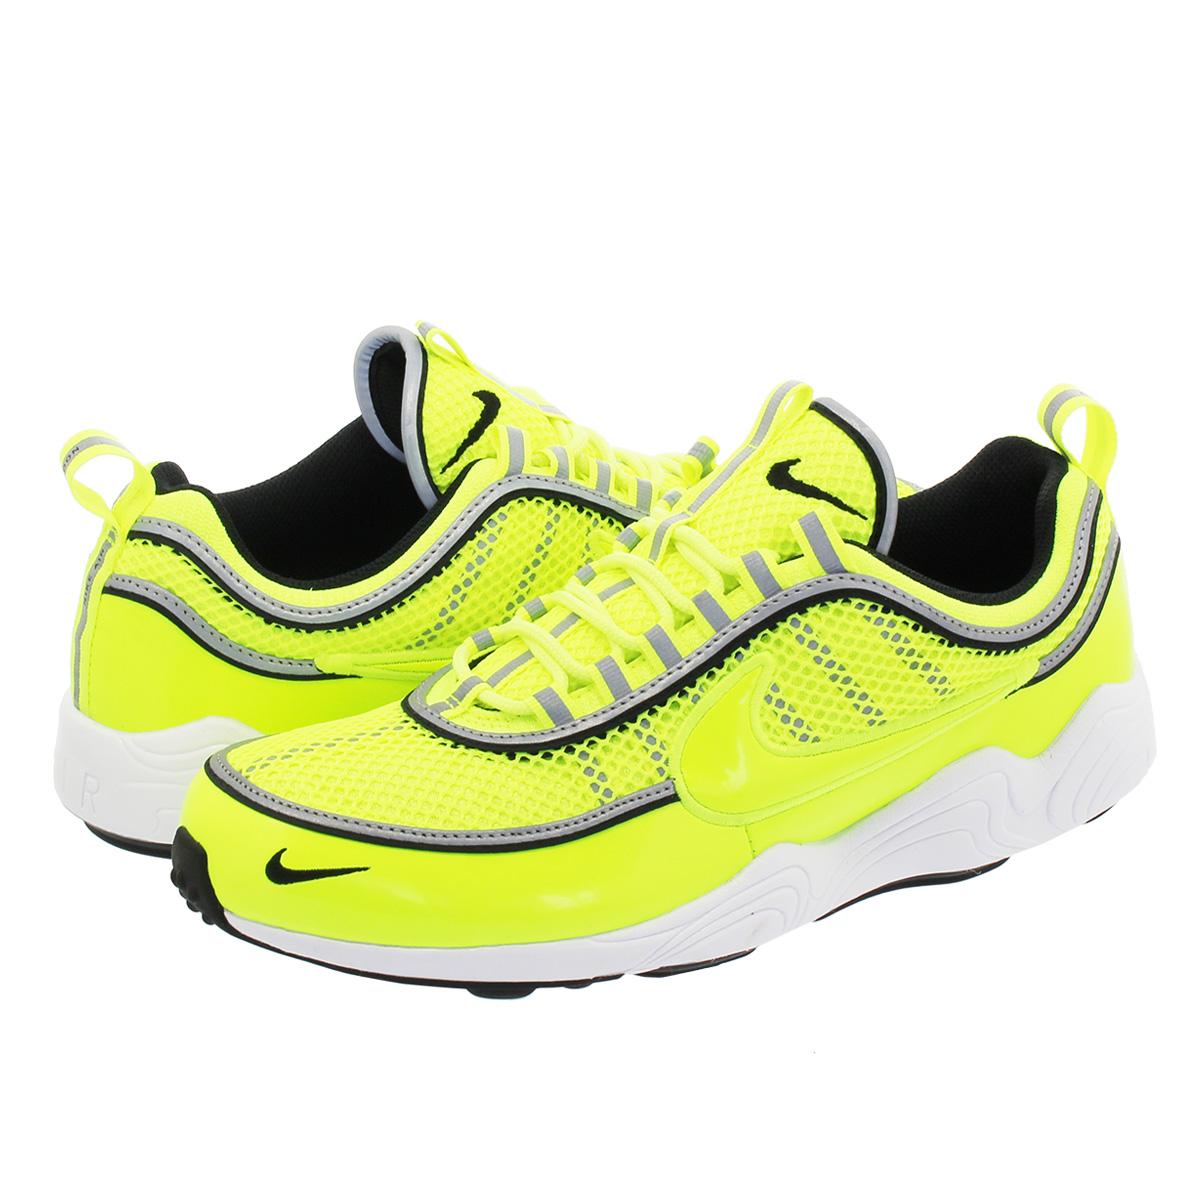 SELECT SHOP LOWTEX Rakuten Global Global Rakuten Rakuten Global Market: Nike ZOOM a21b1e